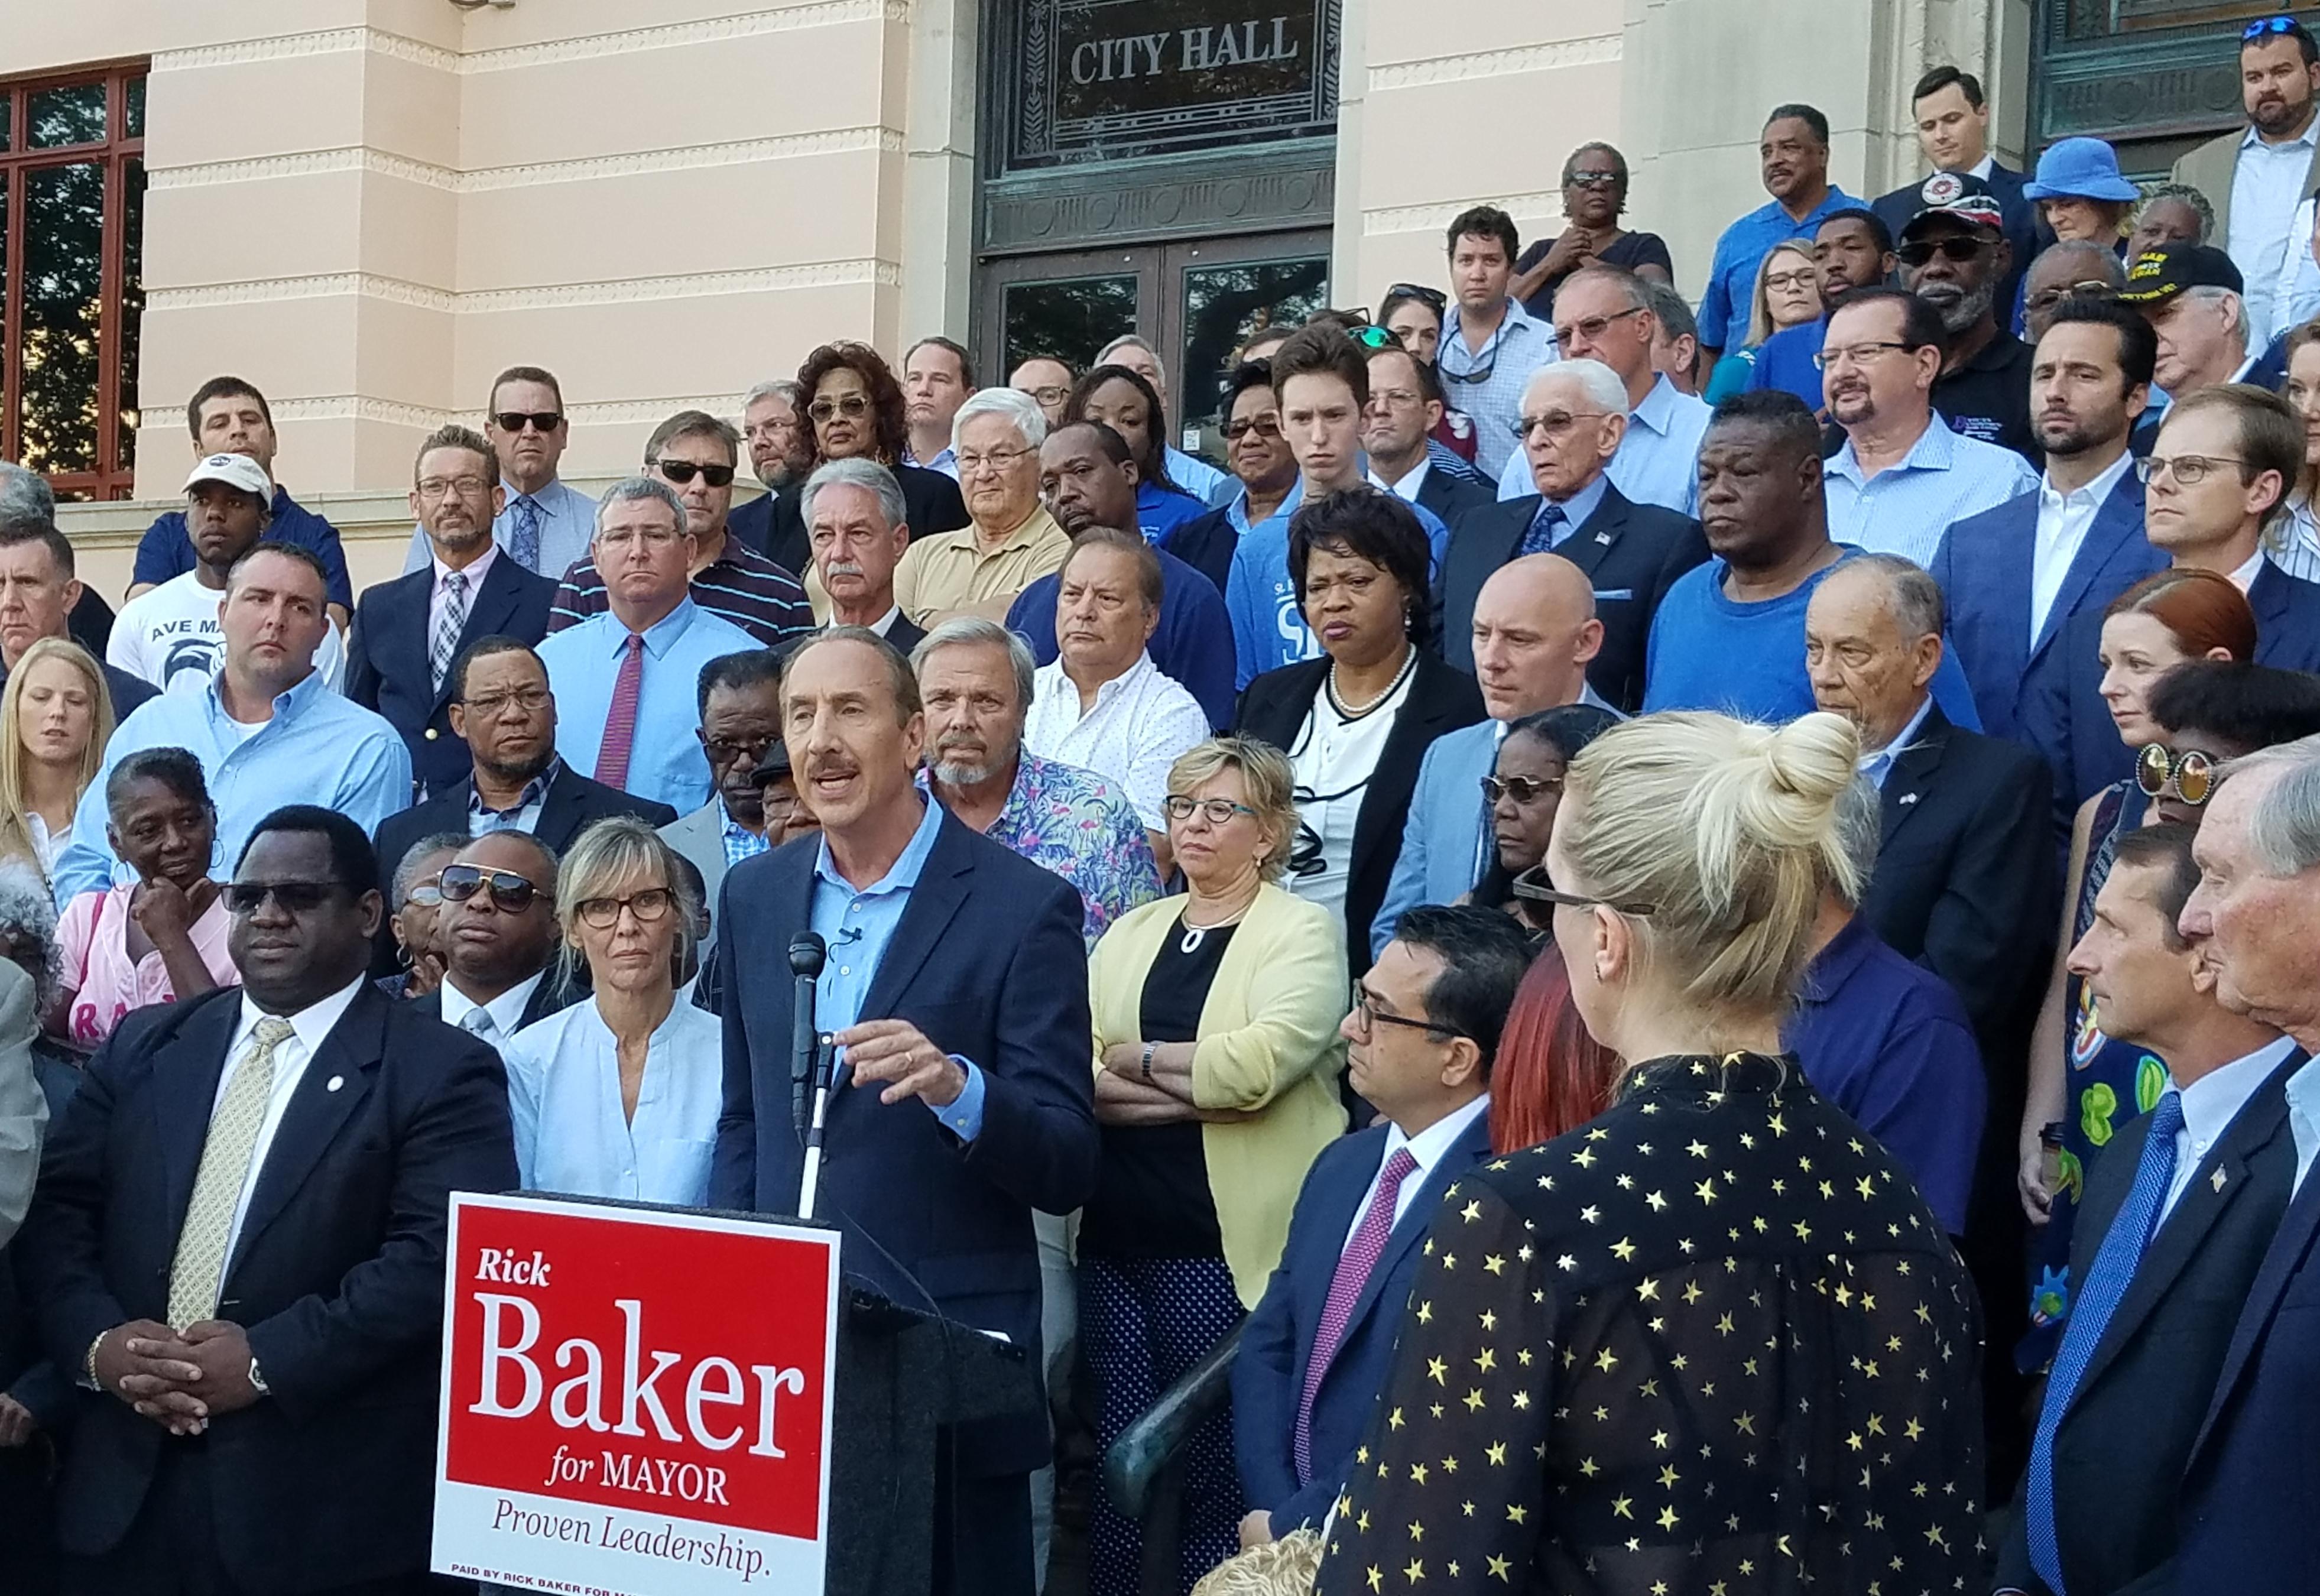 Rick Baker is running again for Mayor of St. Pete